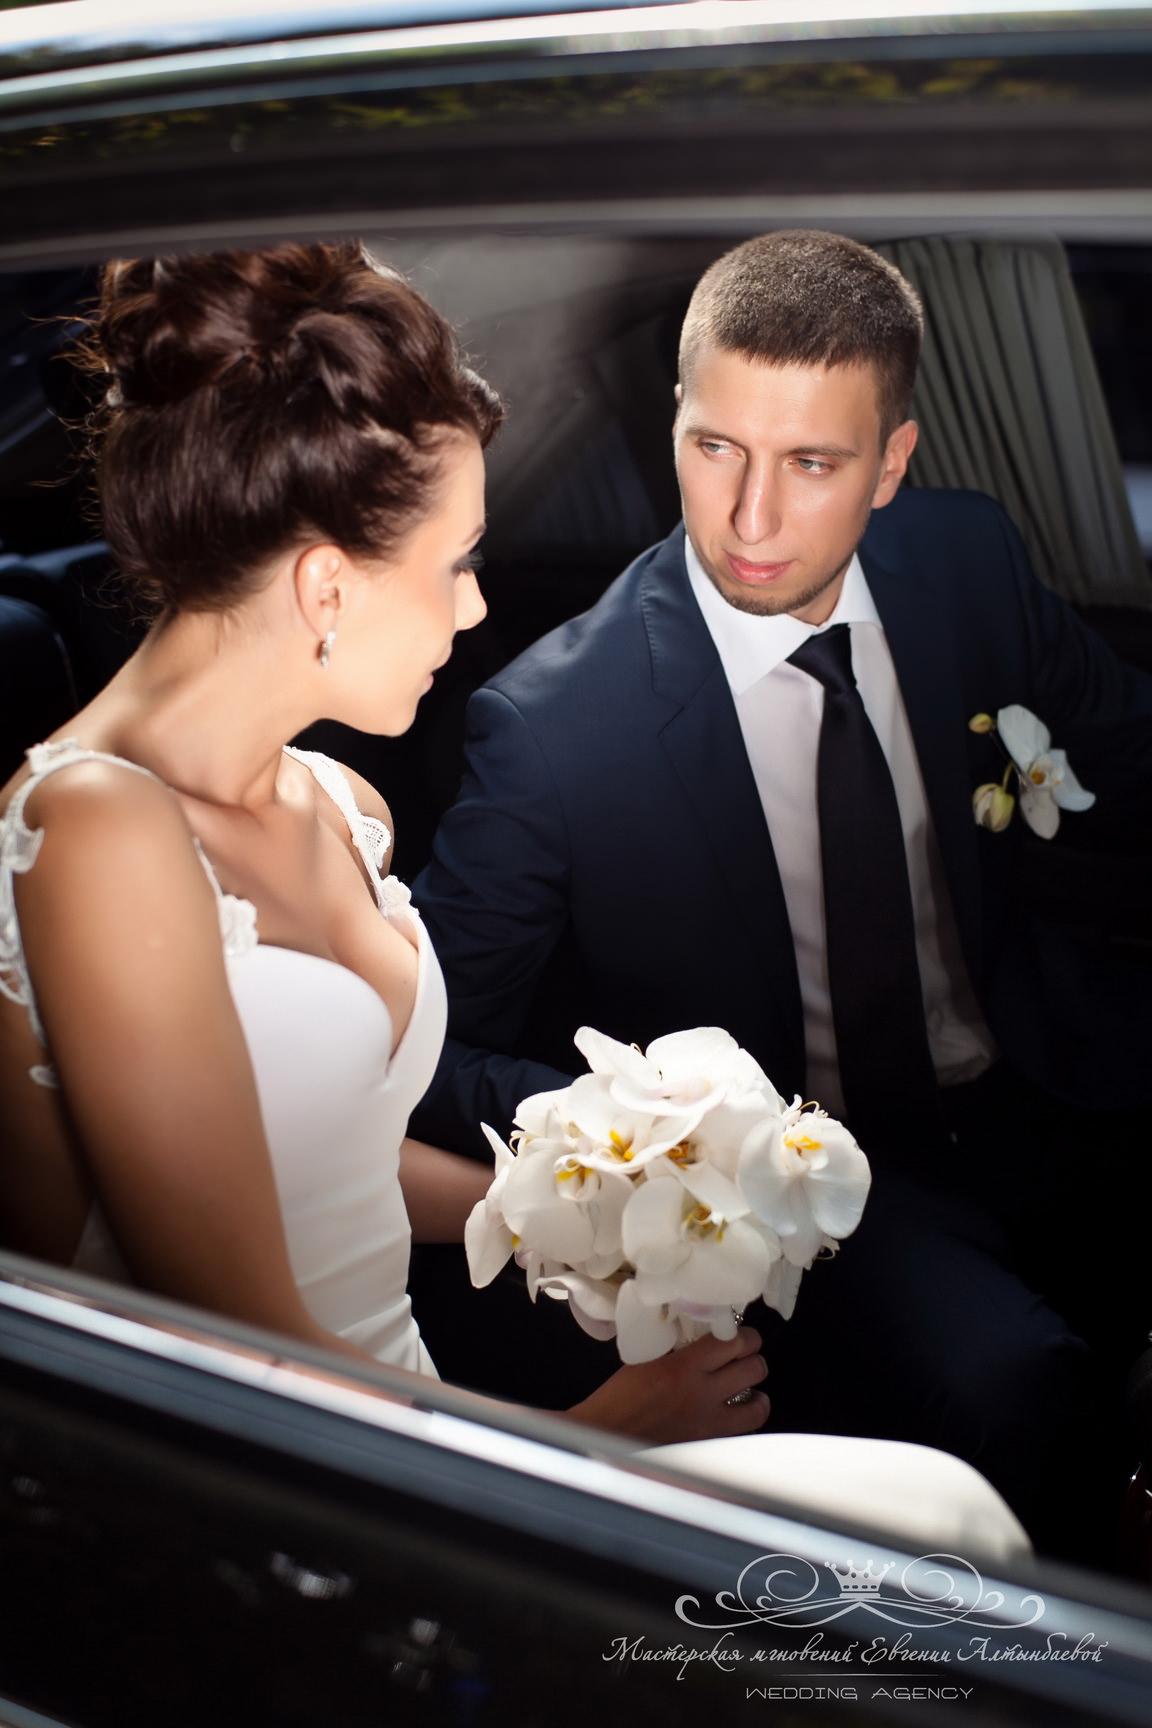 Аренда Майбах на свадьбу